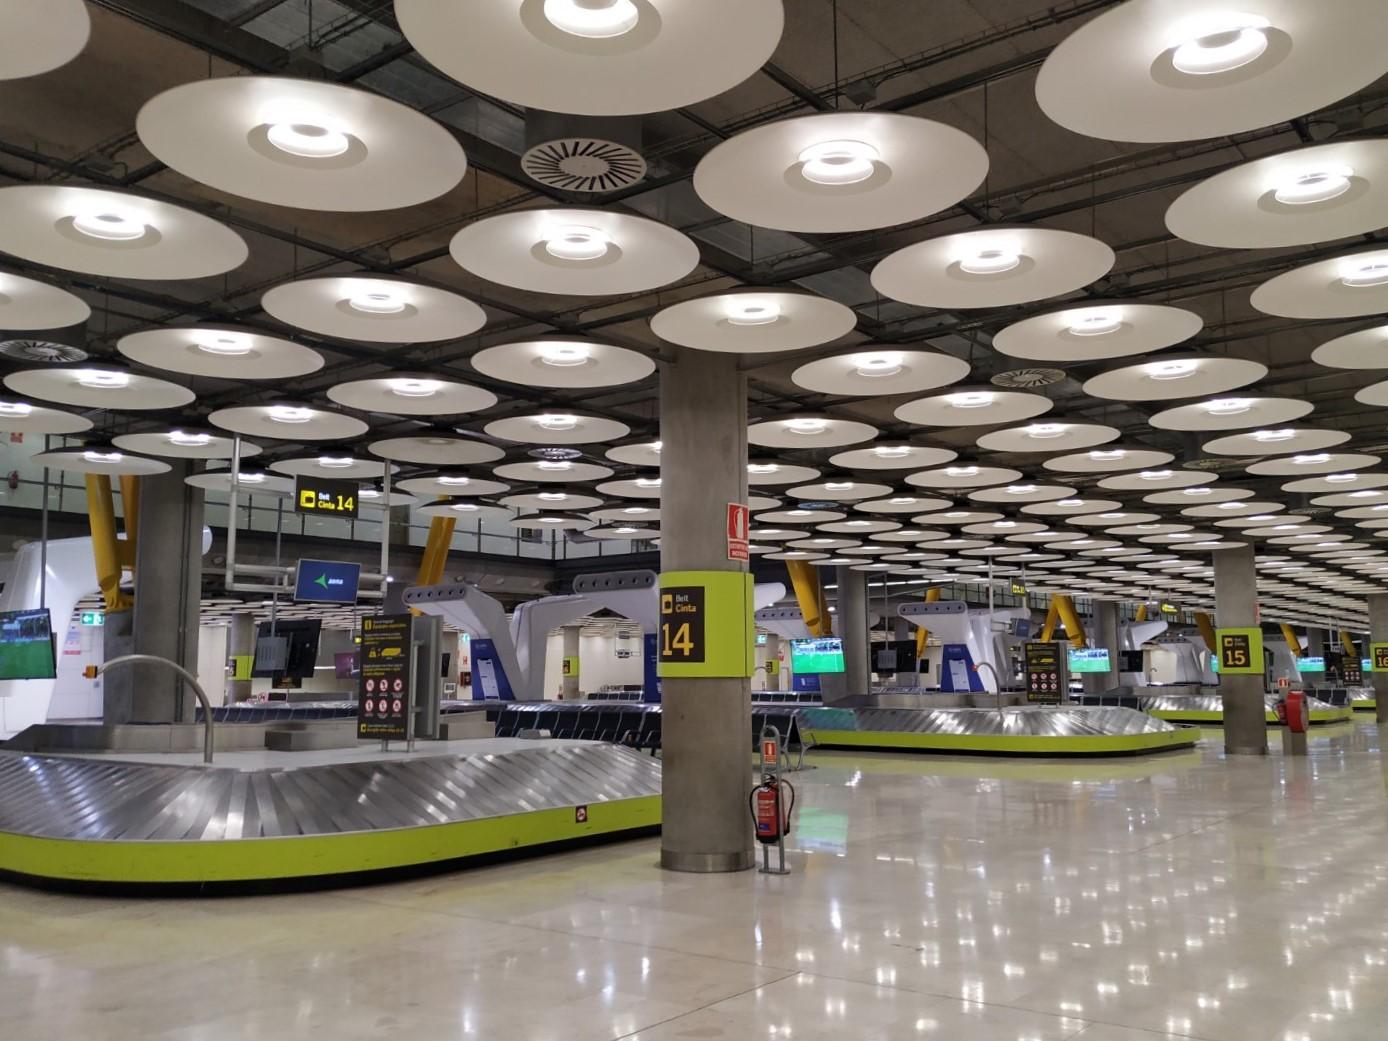 Зал выдачи багажа в терминале Т4 аэропорта Мадрид Барахас